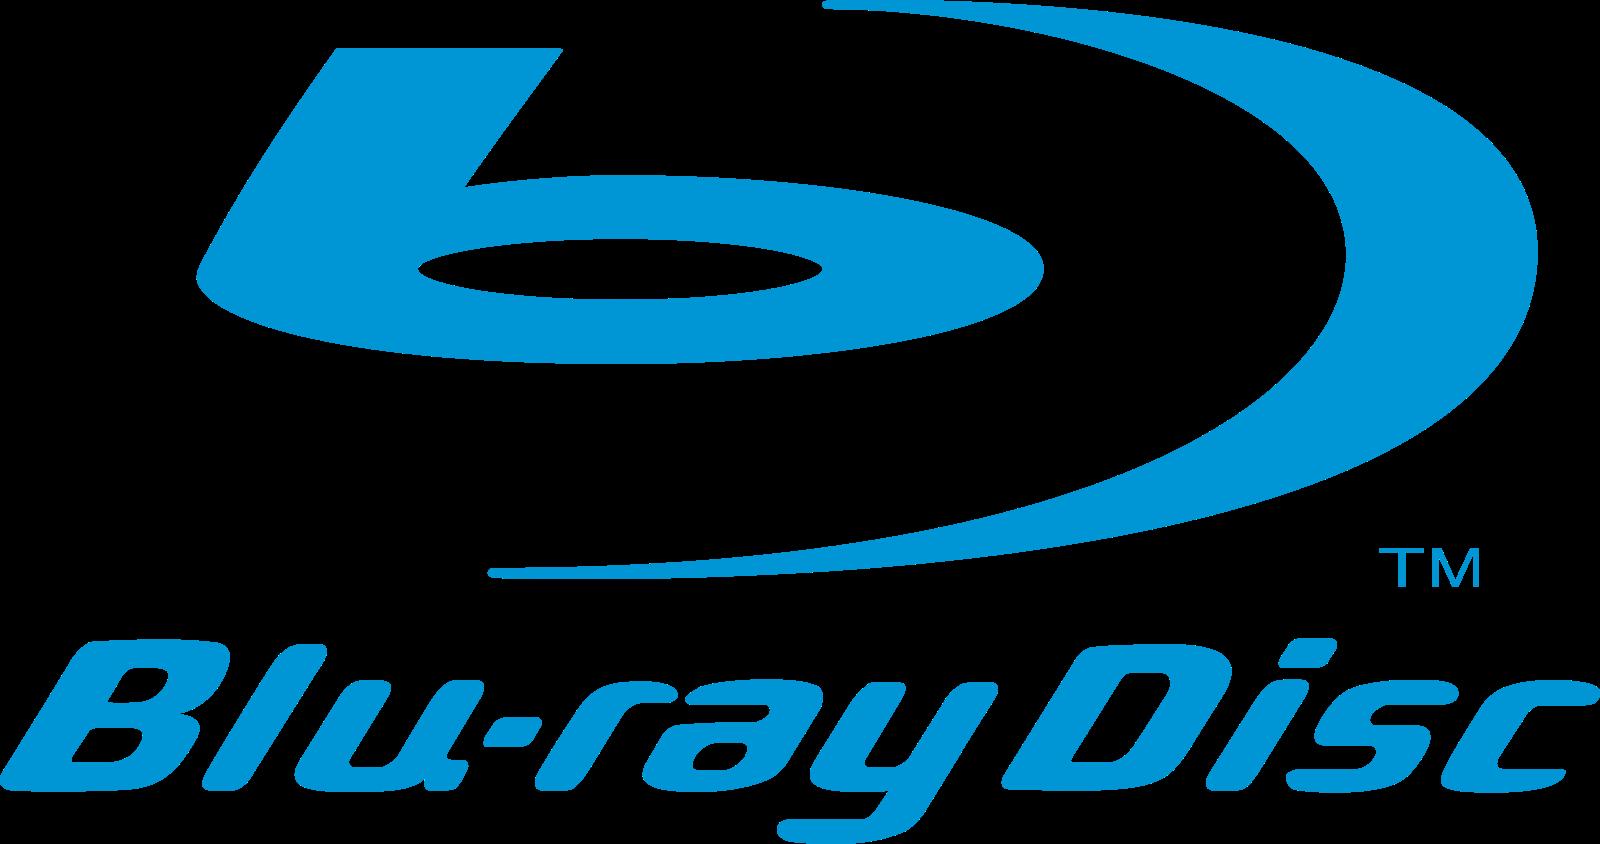 blu ray logo 2 - Blu-ray Logo